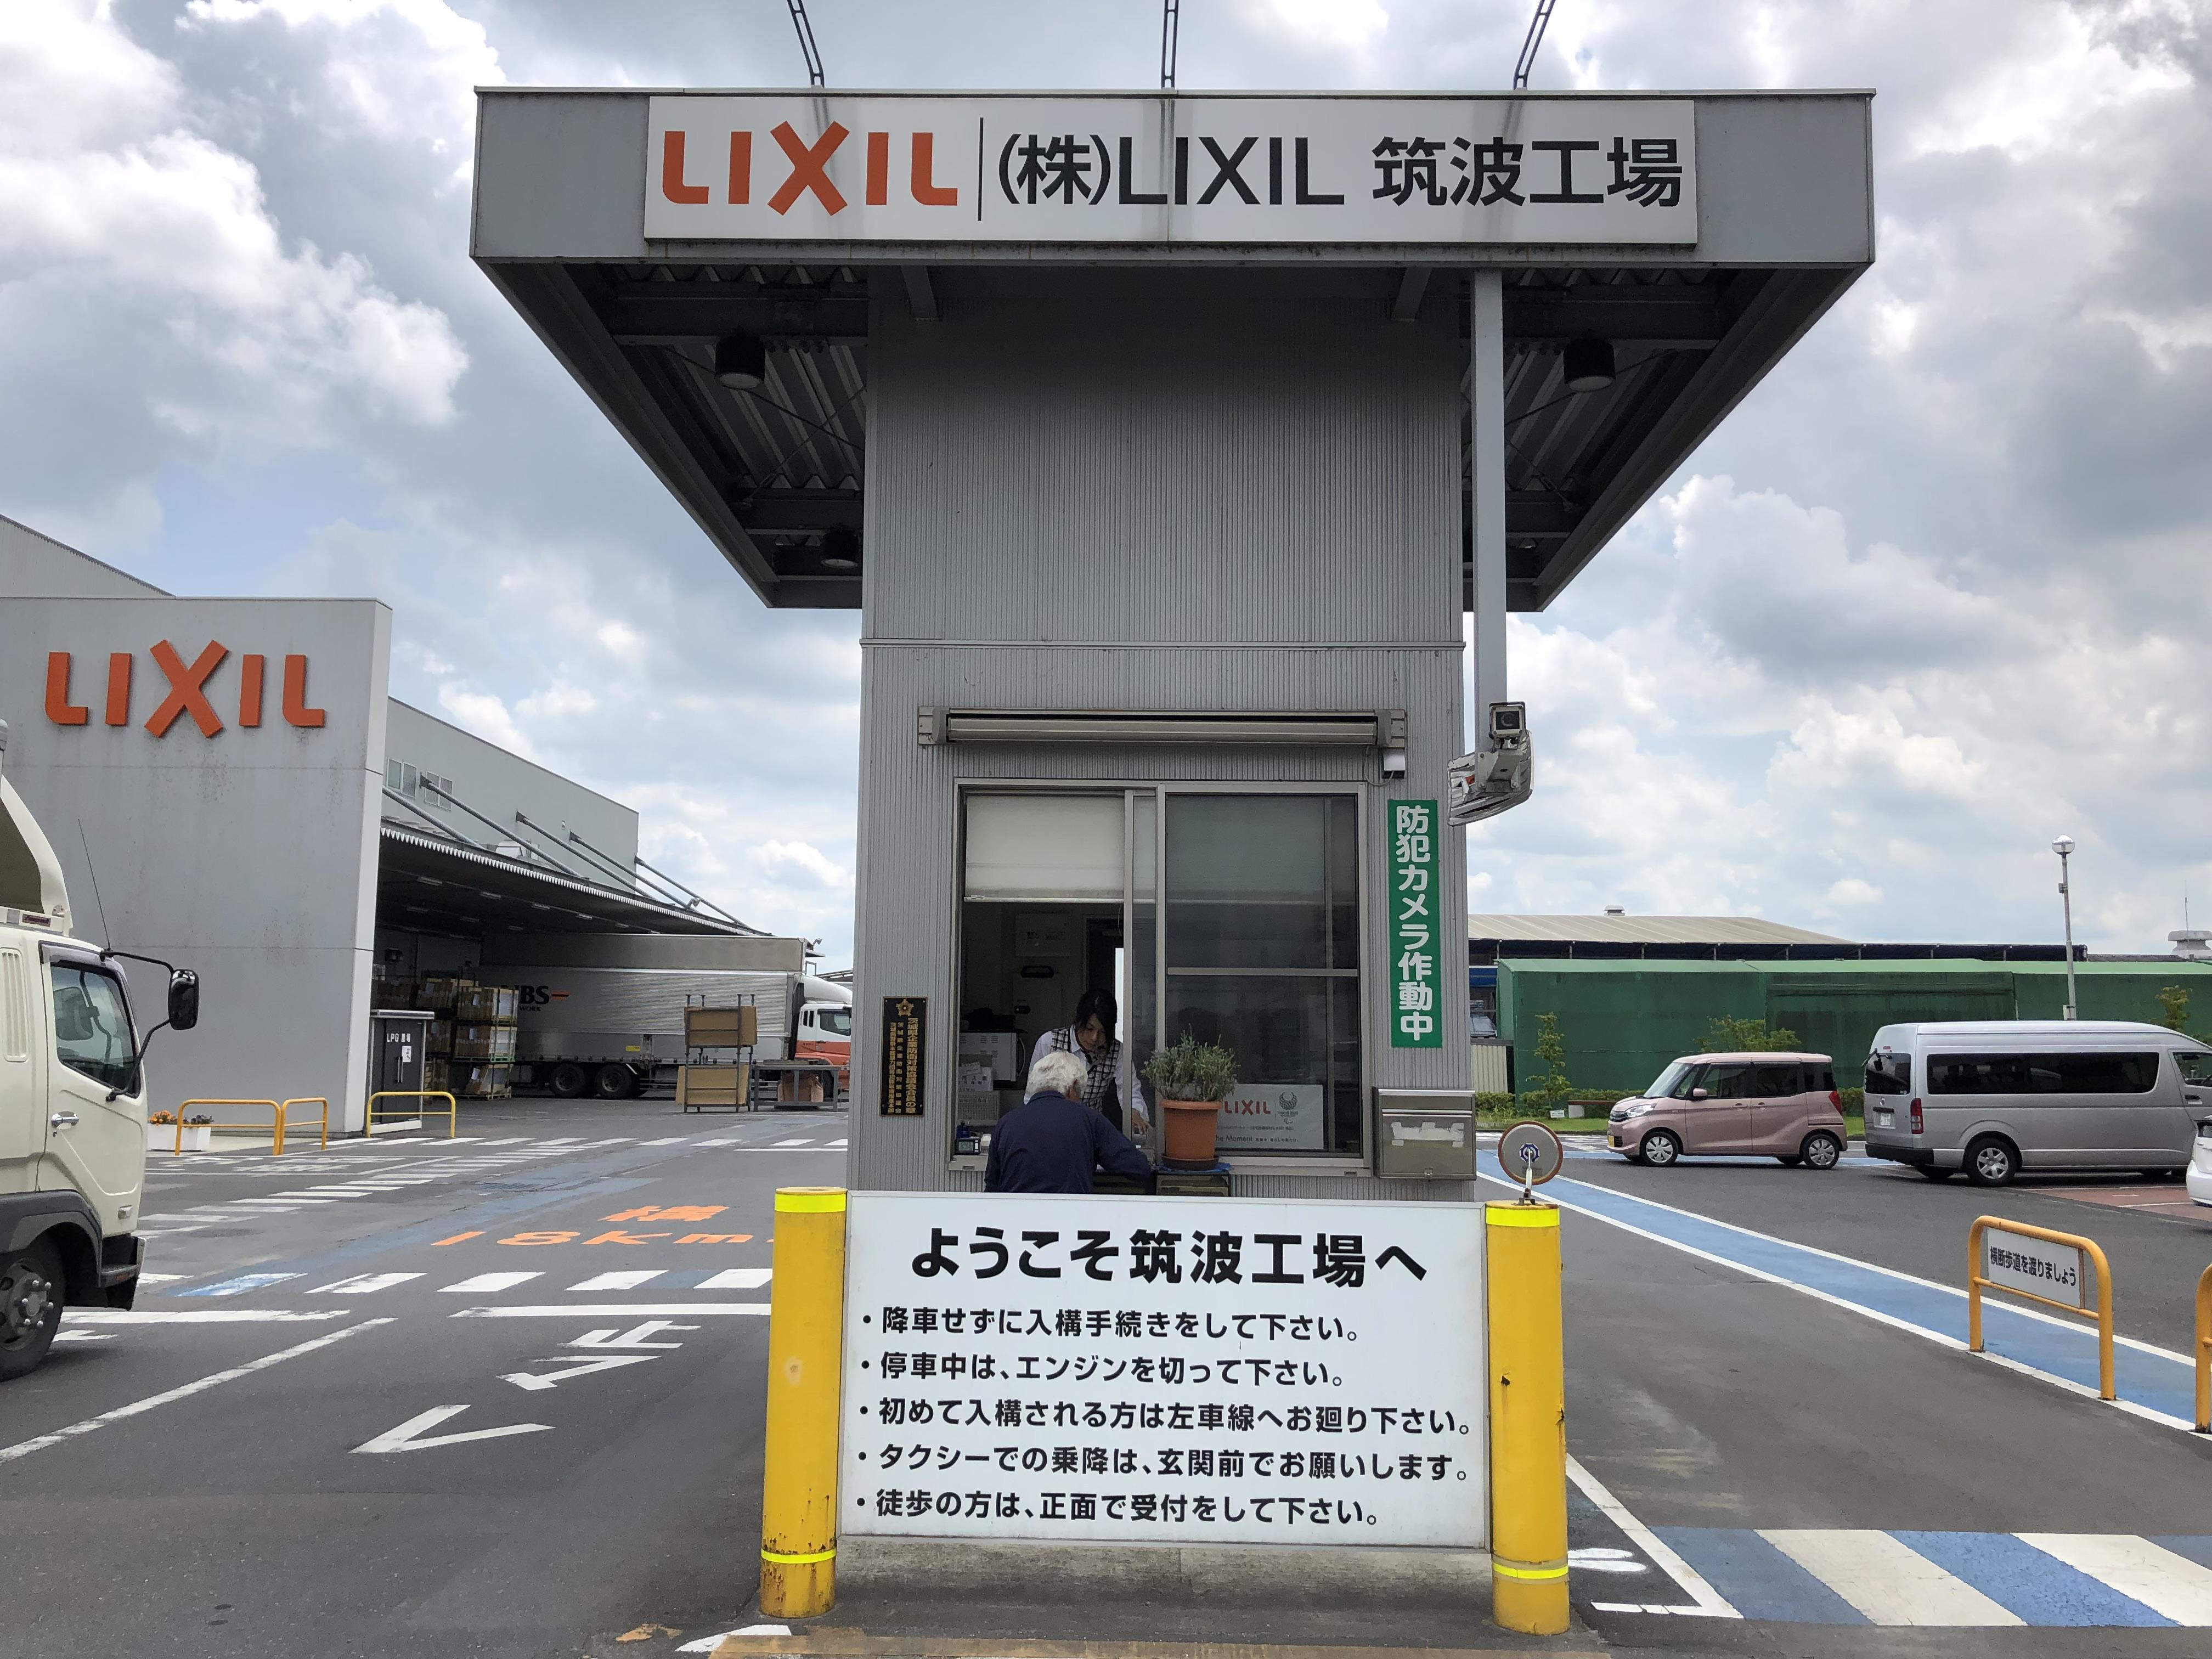 LIXIL筑波工場見学&スパージュ入浴体験